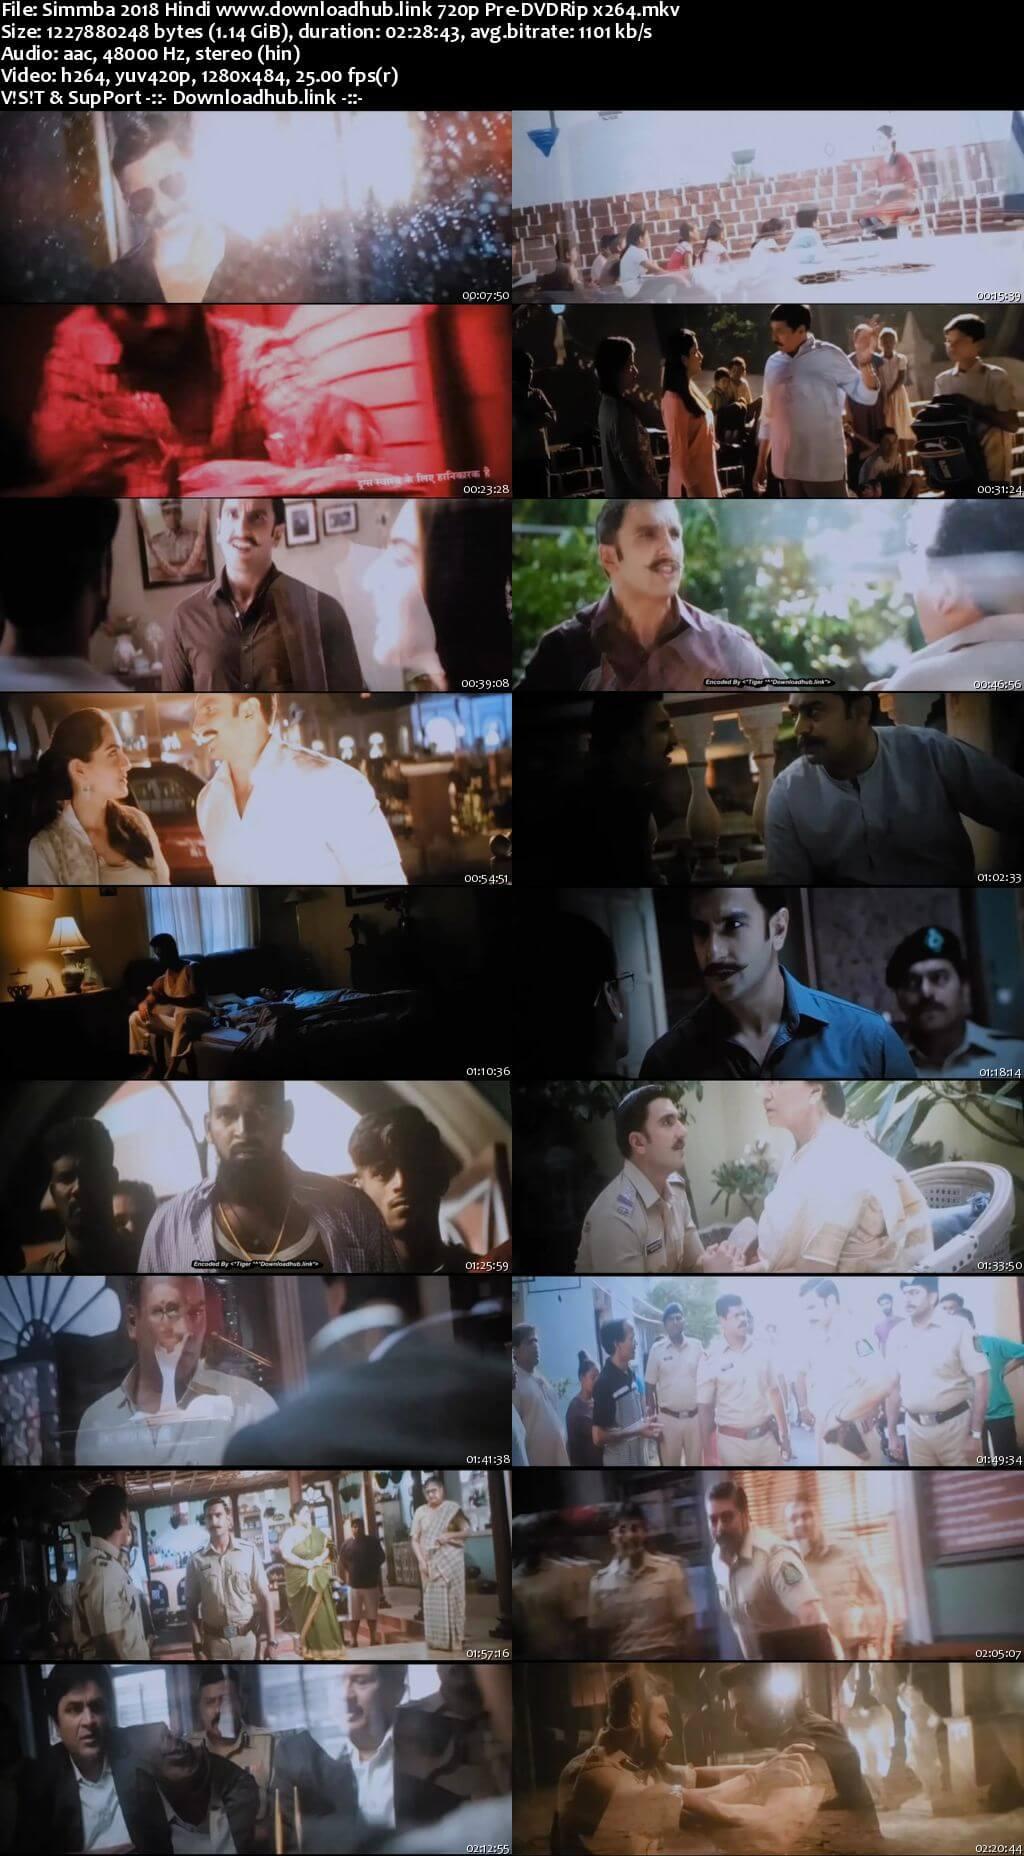 Simmba 2018 Hindi 720p Pre-DVDRip x264